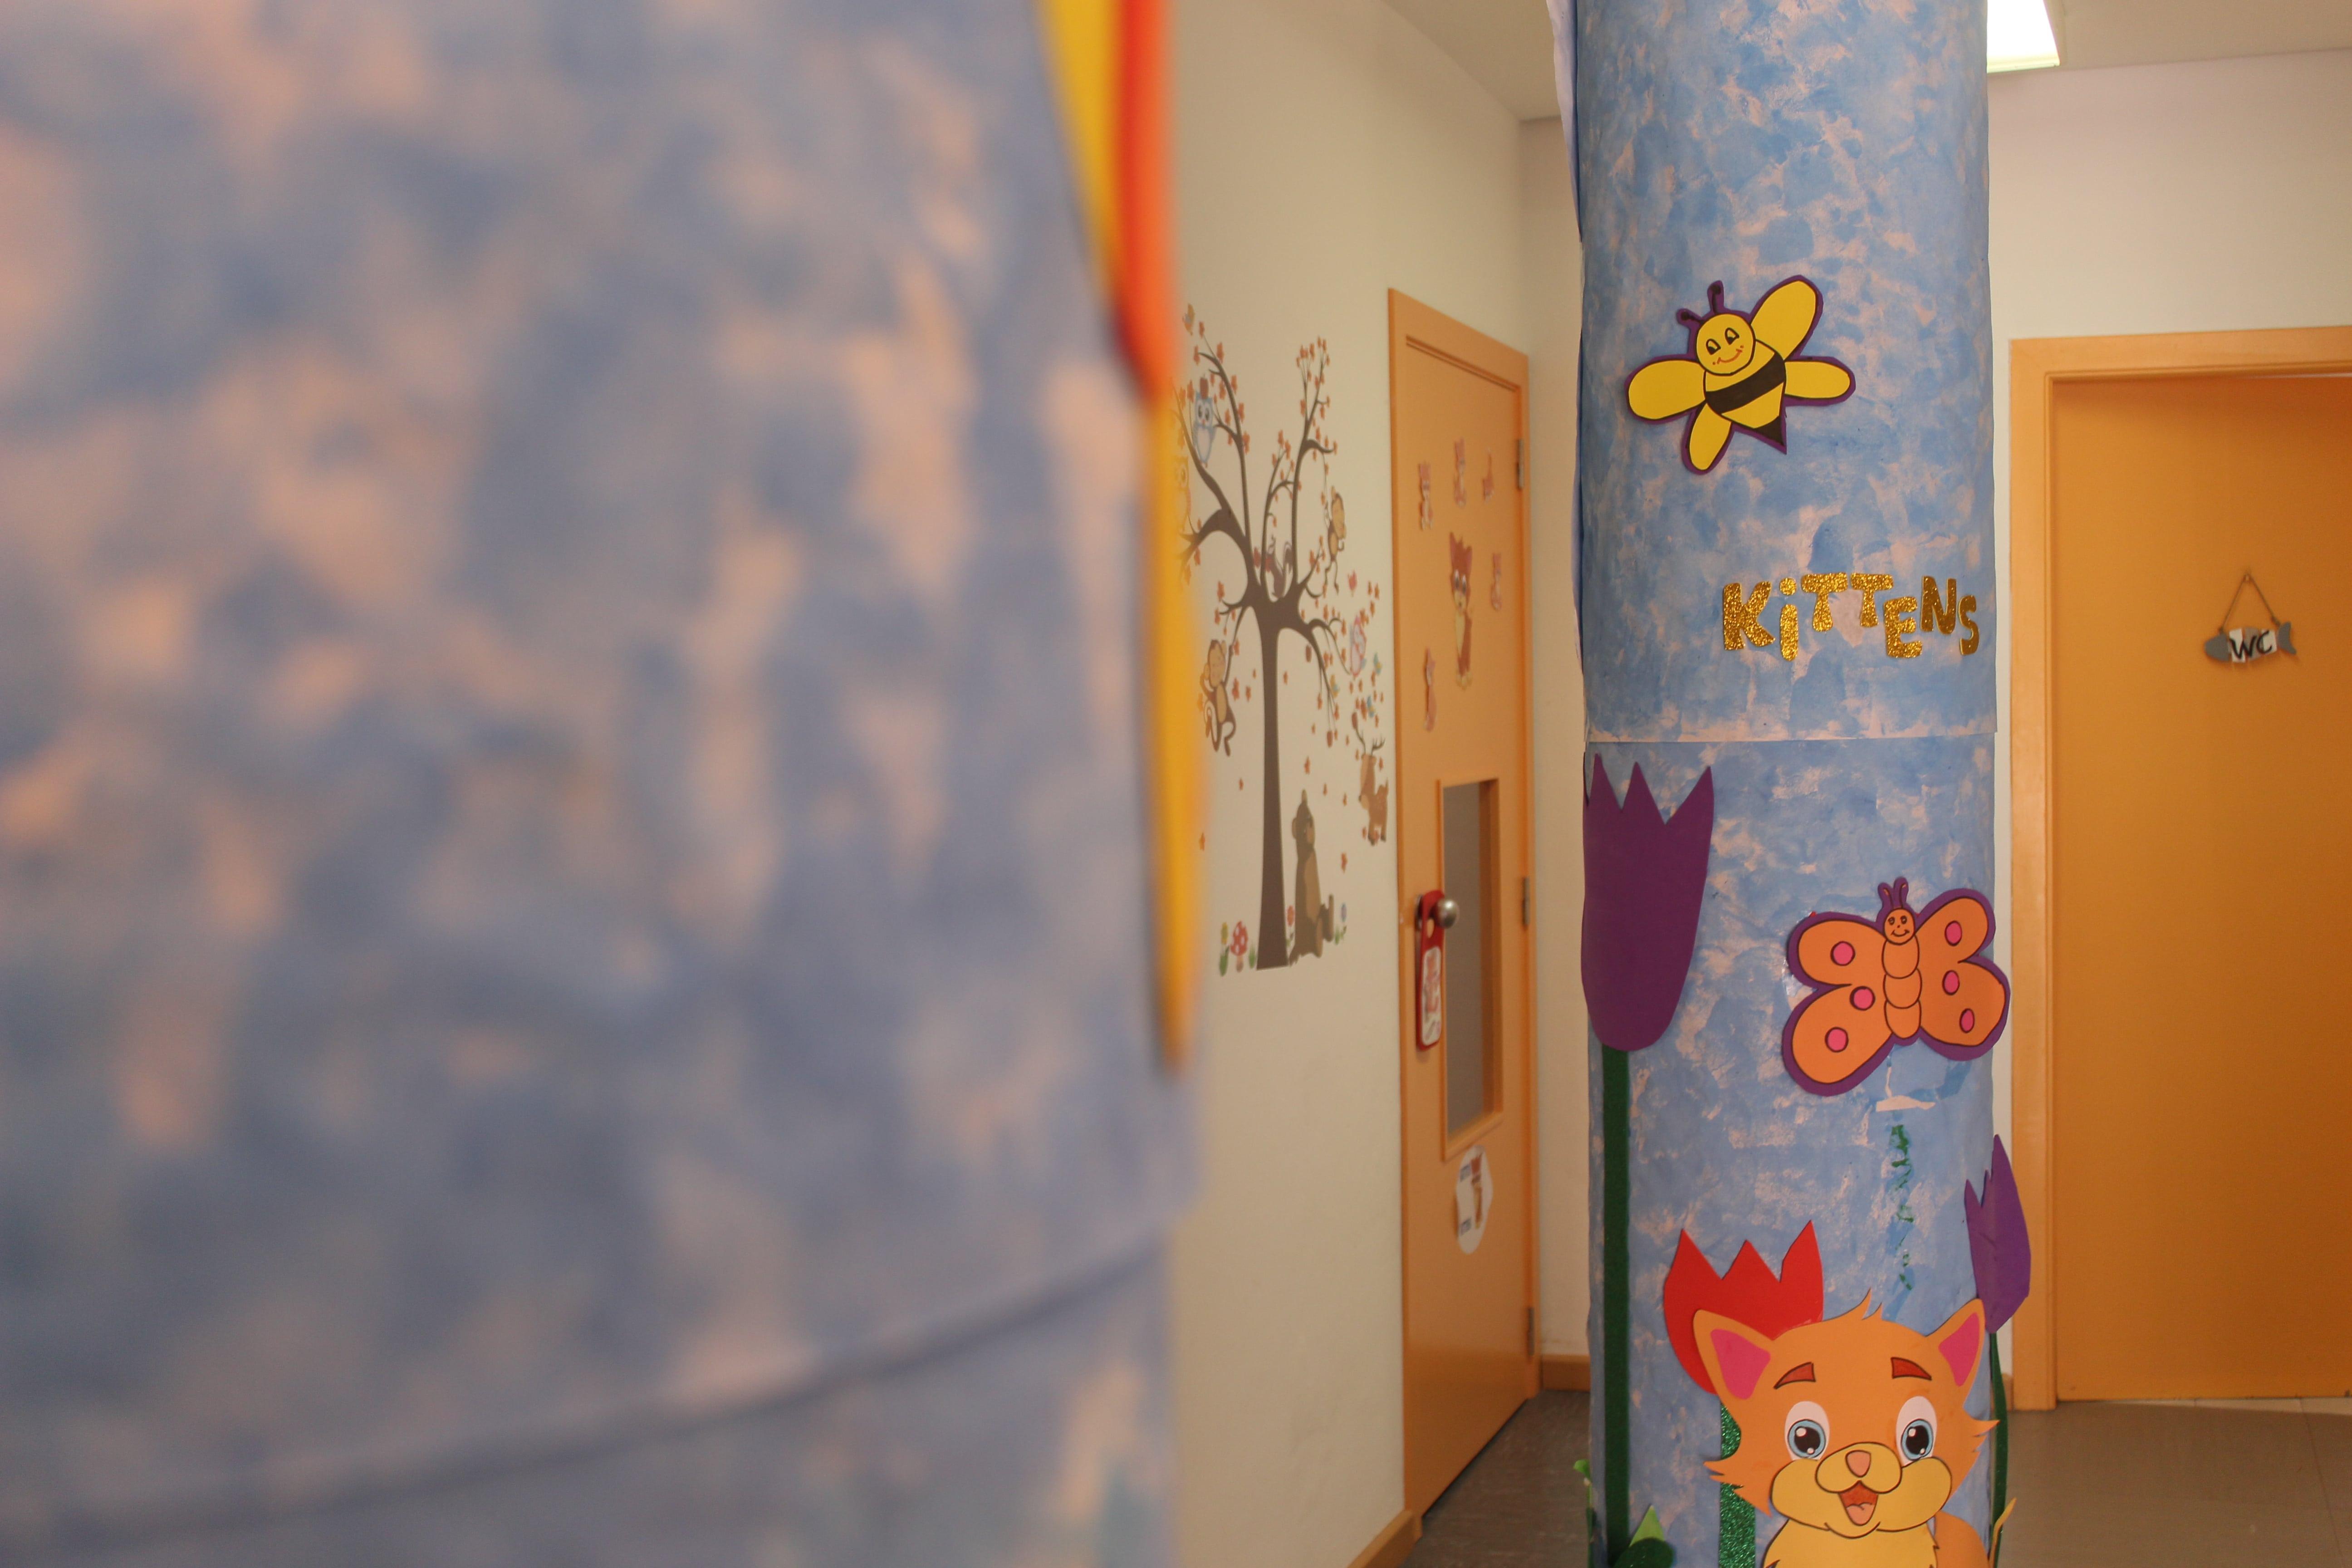 escuela infantil bilingüe en Valencia - columna azul